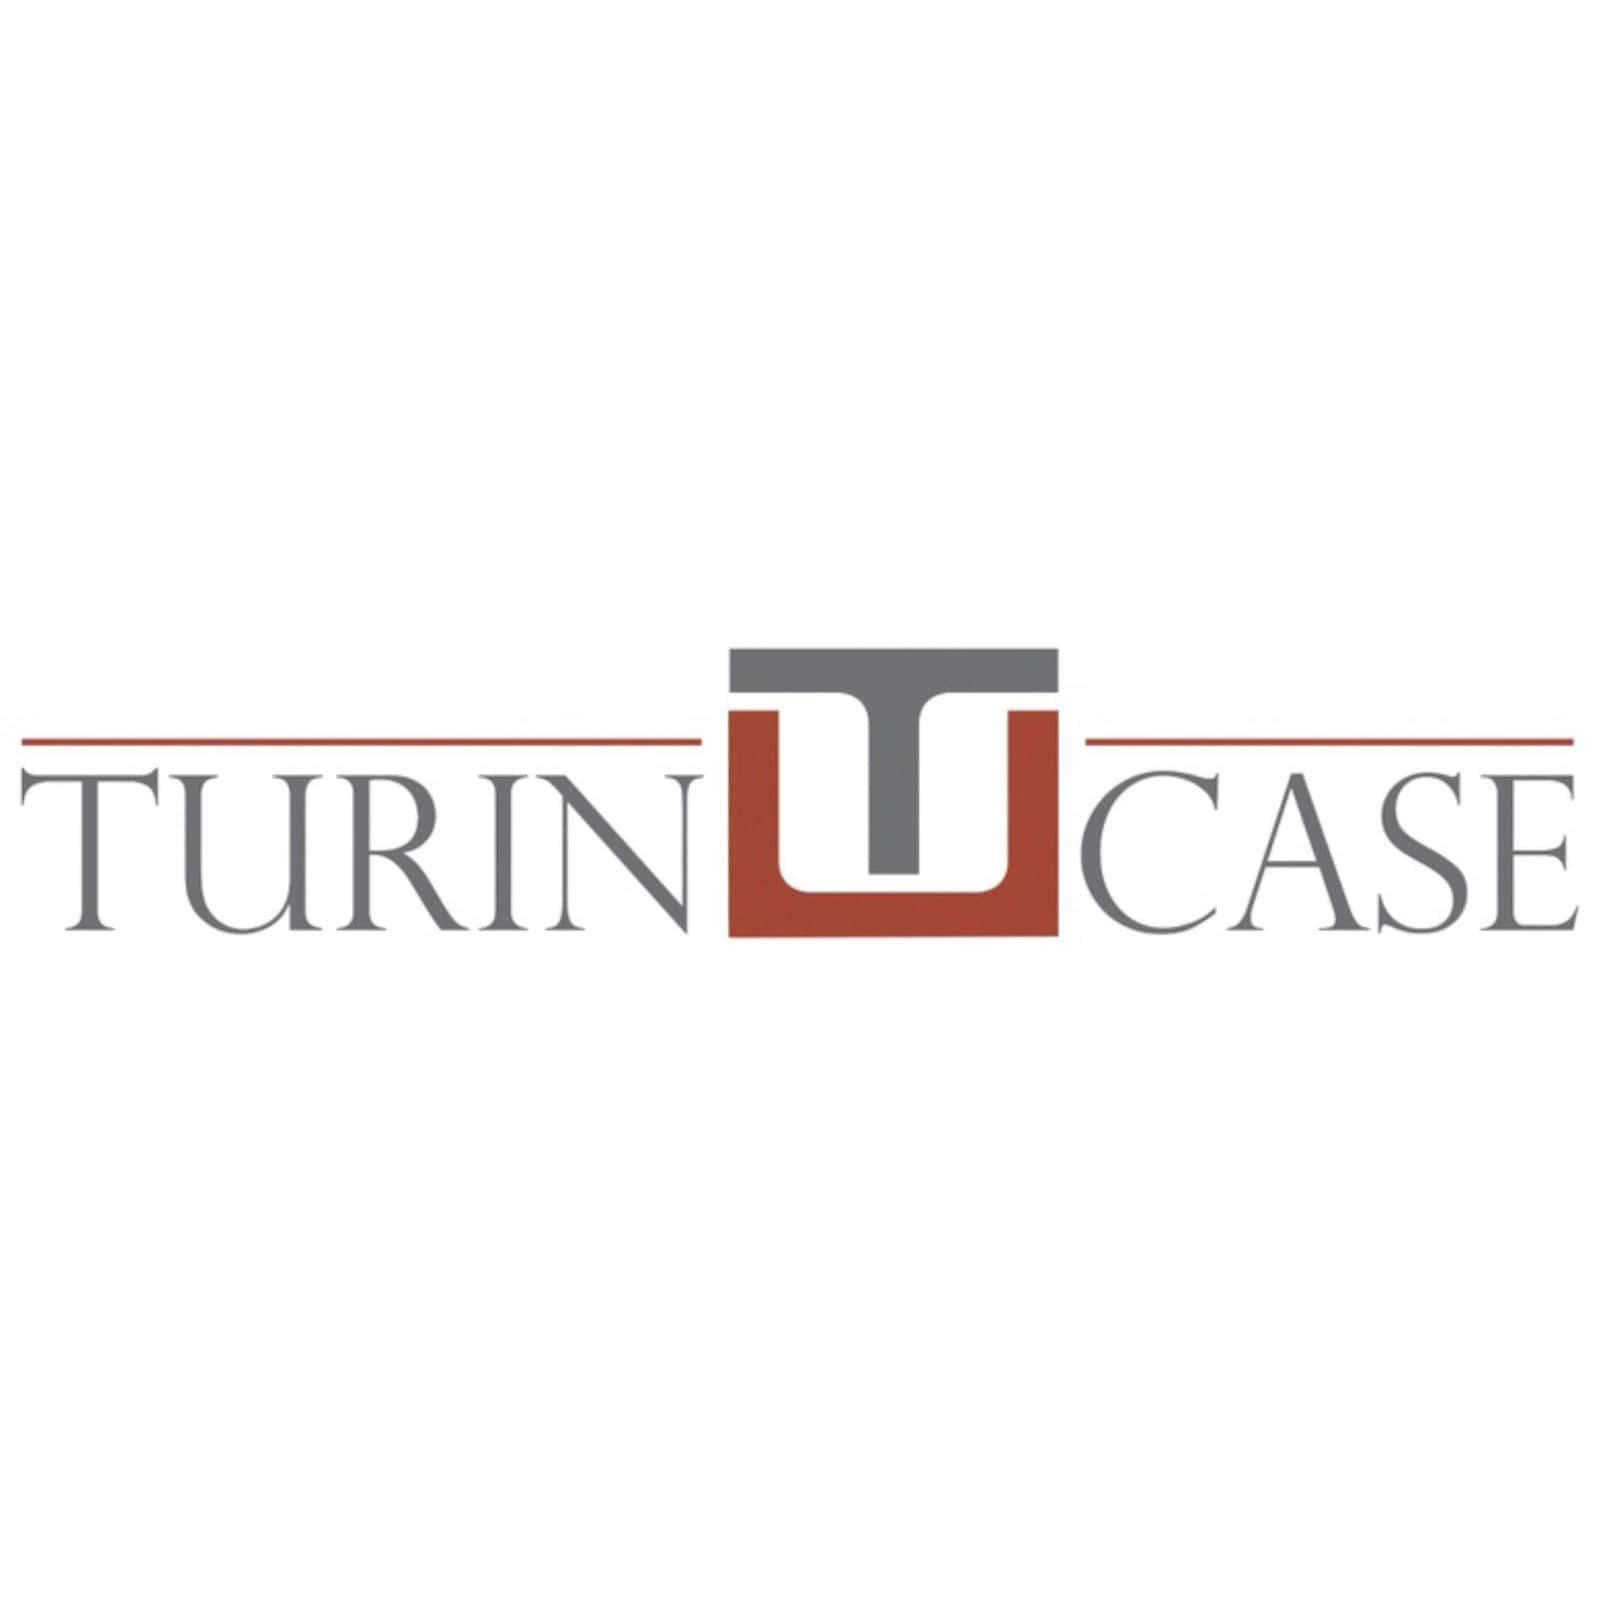 turincase logo